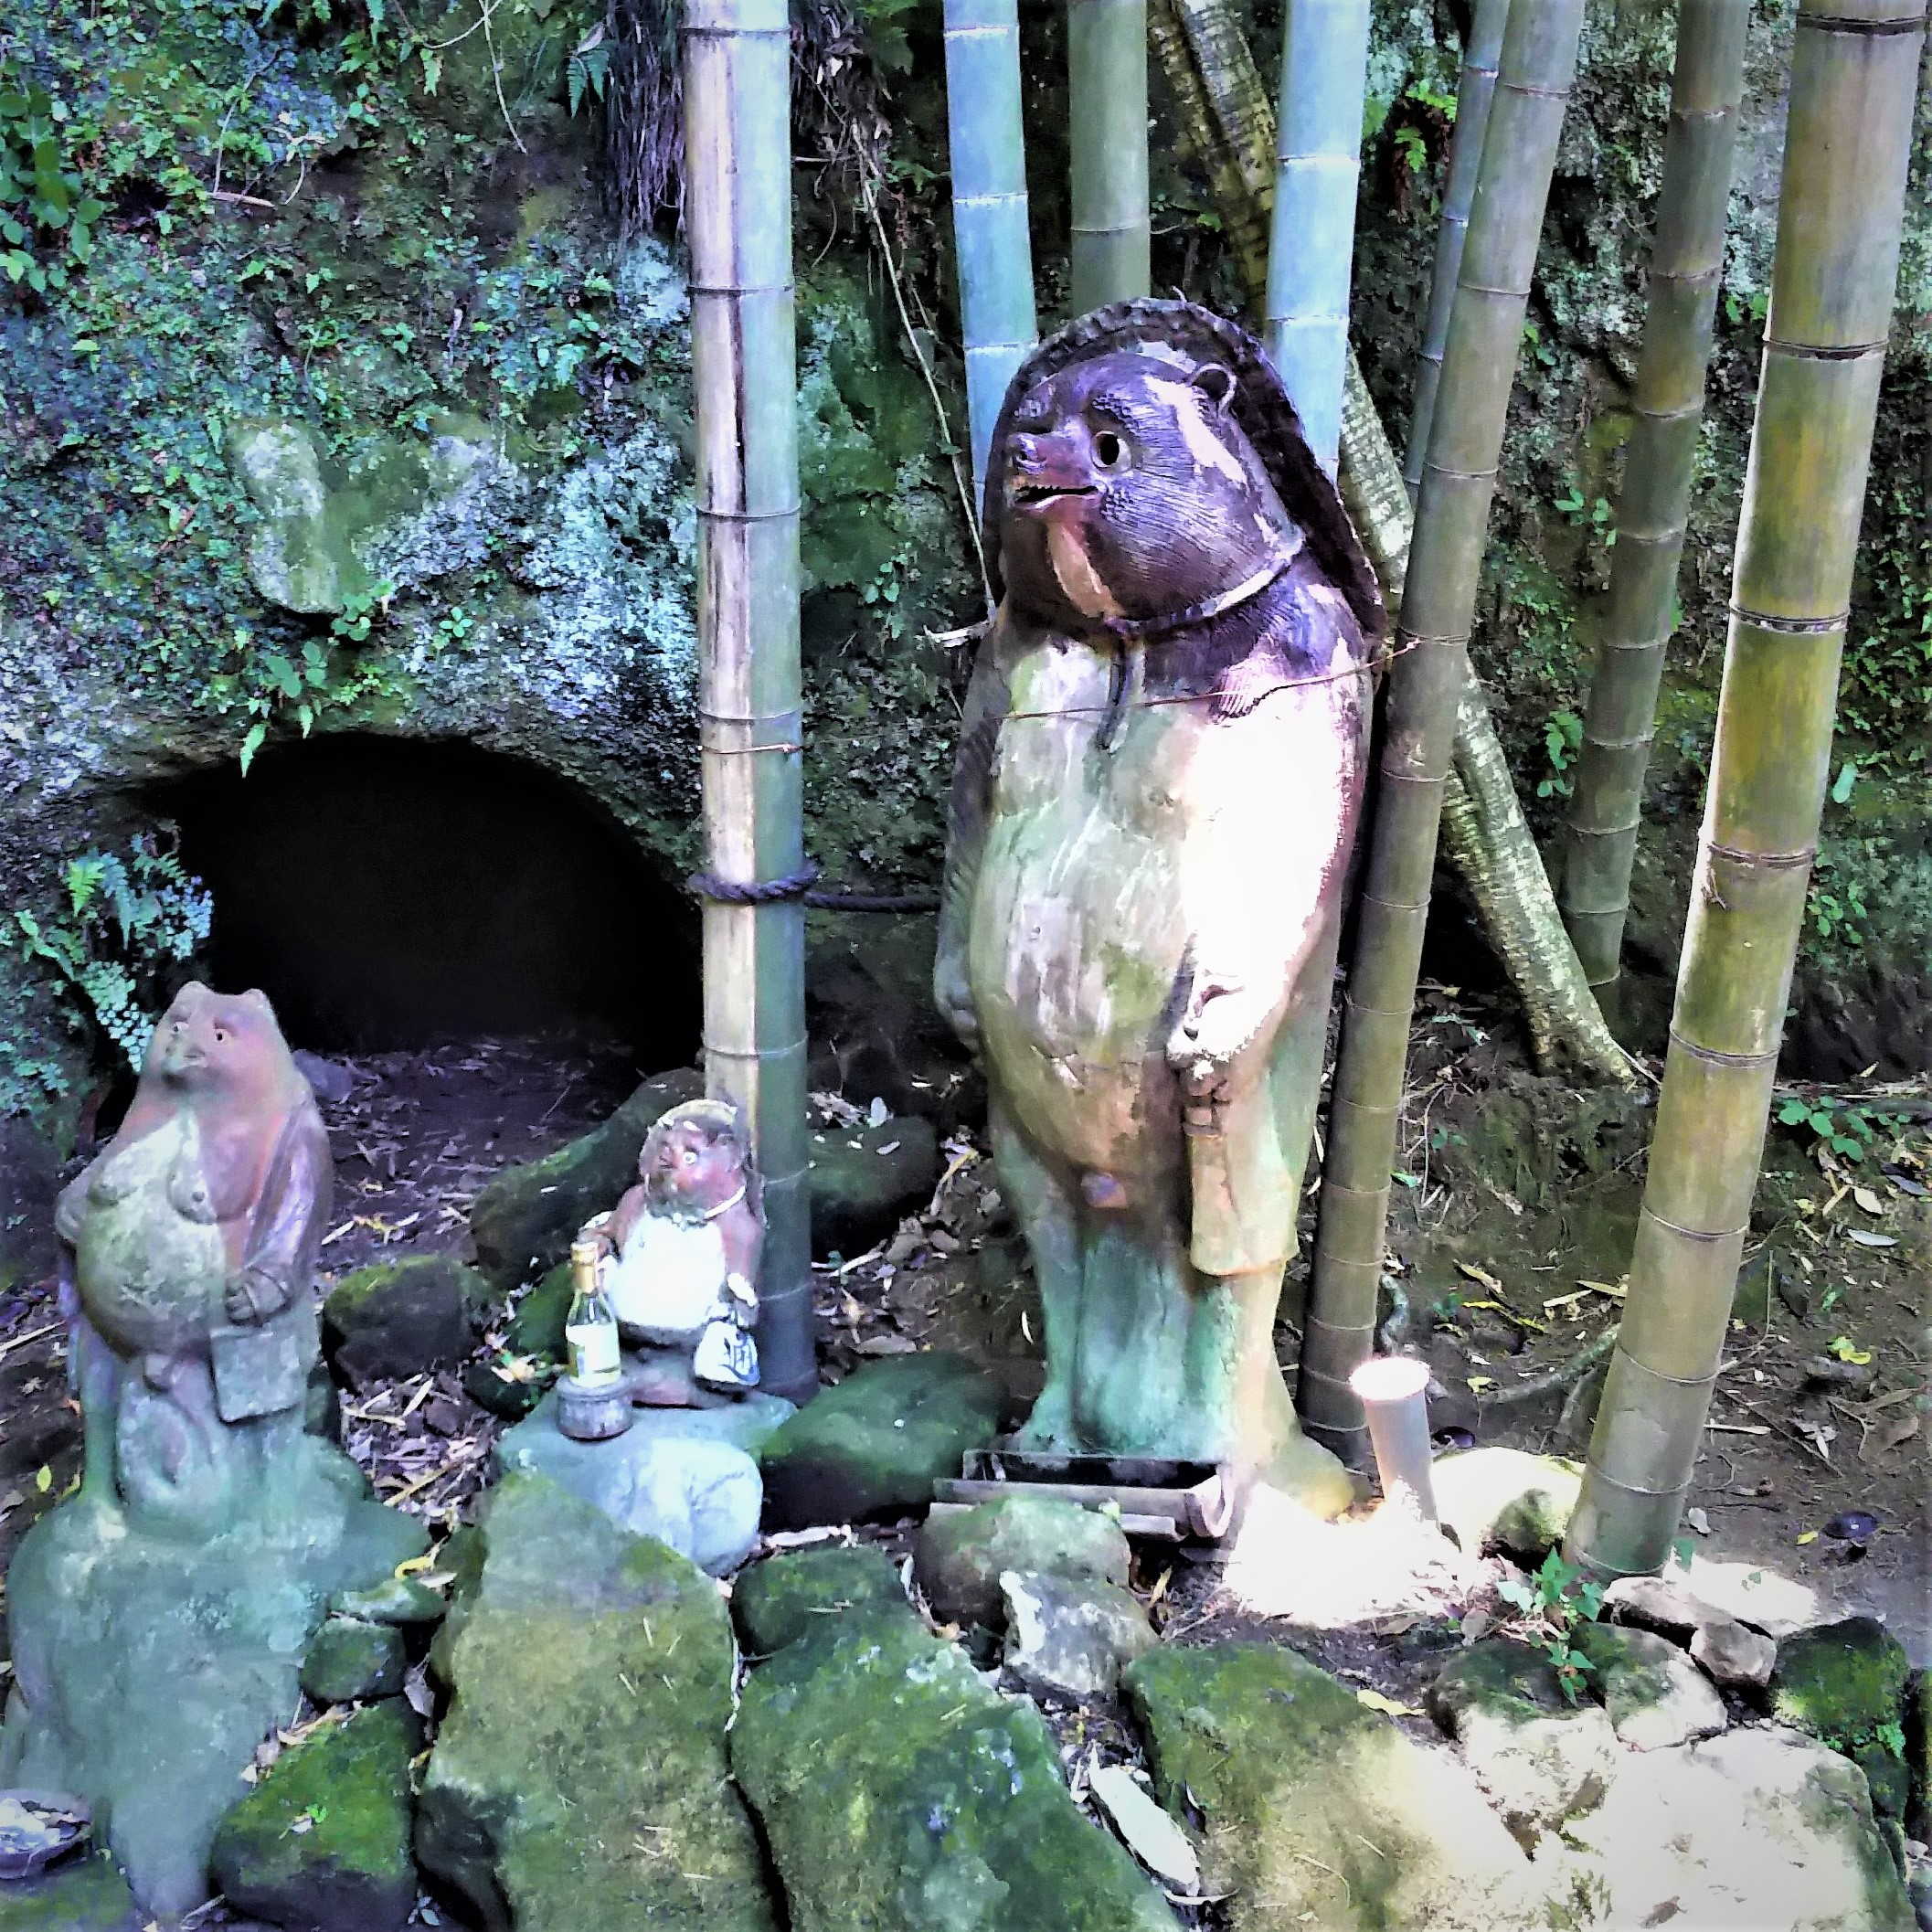 Jhochiji temple's  legendary tanuki the Japanese raccoon dog